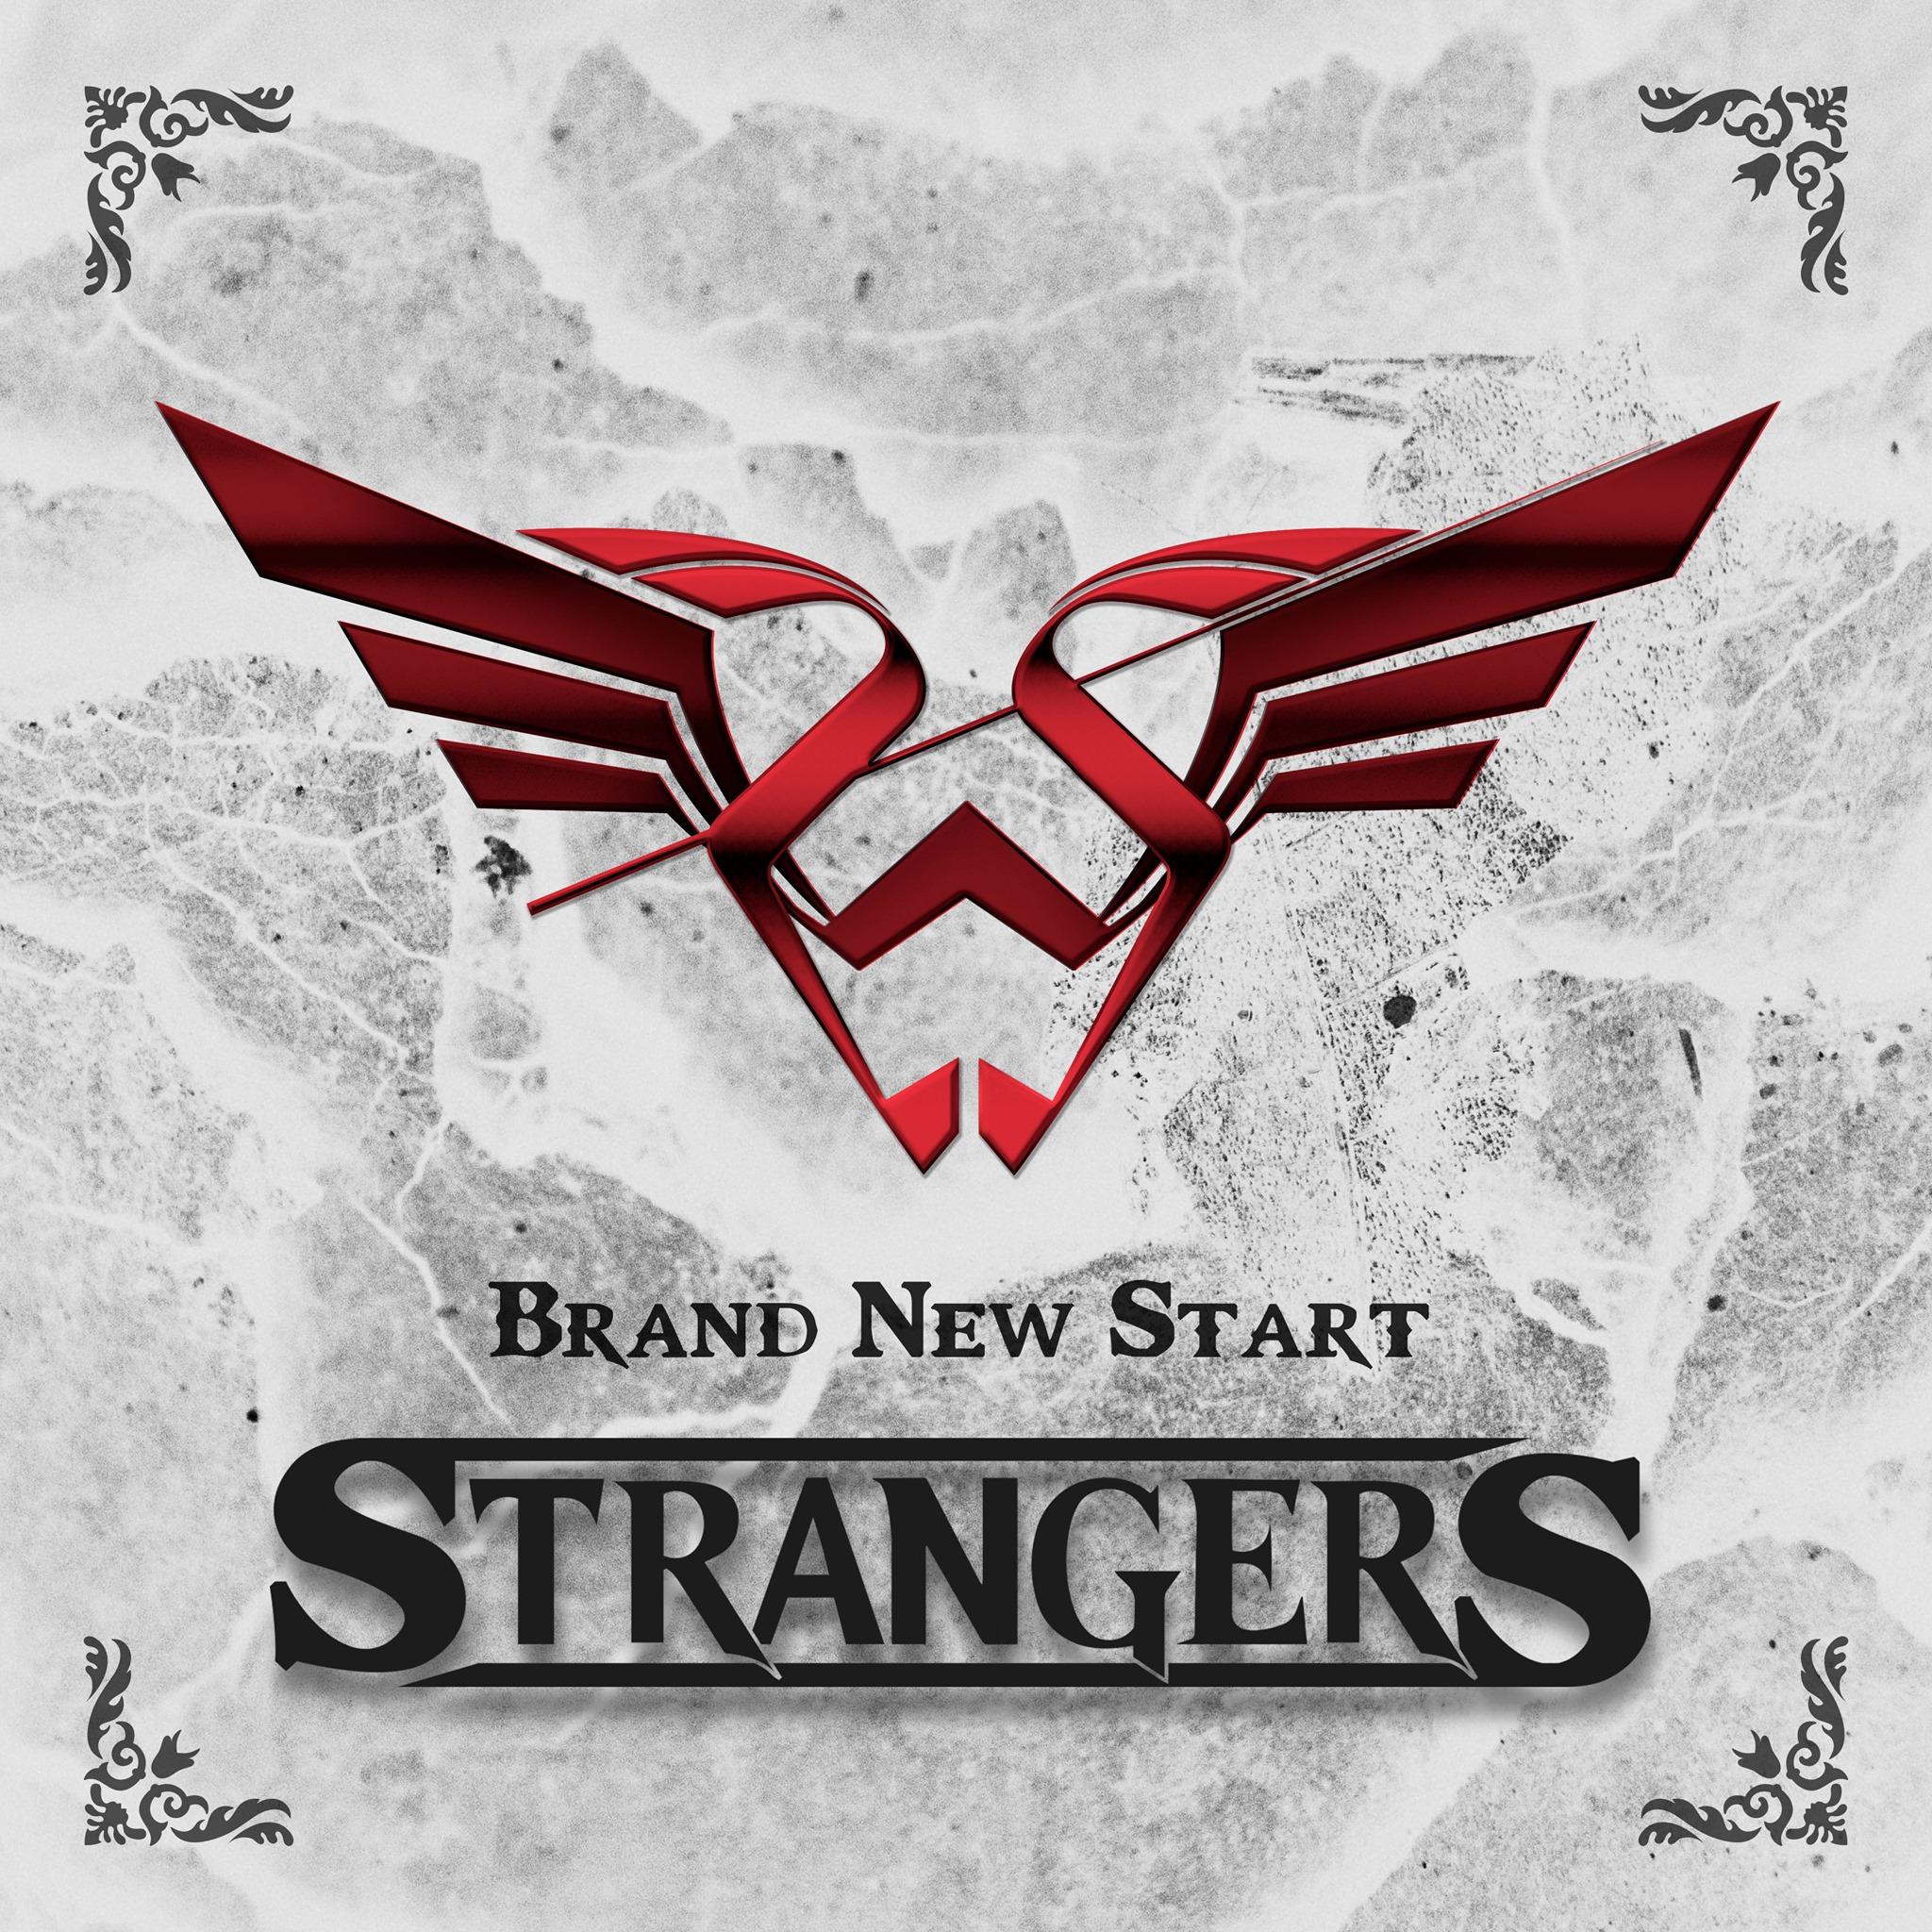 Resultado de imagen de strangers brand new start